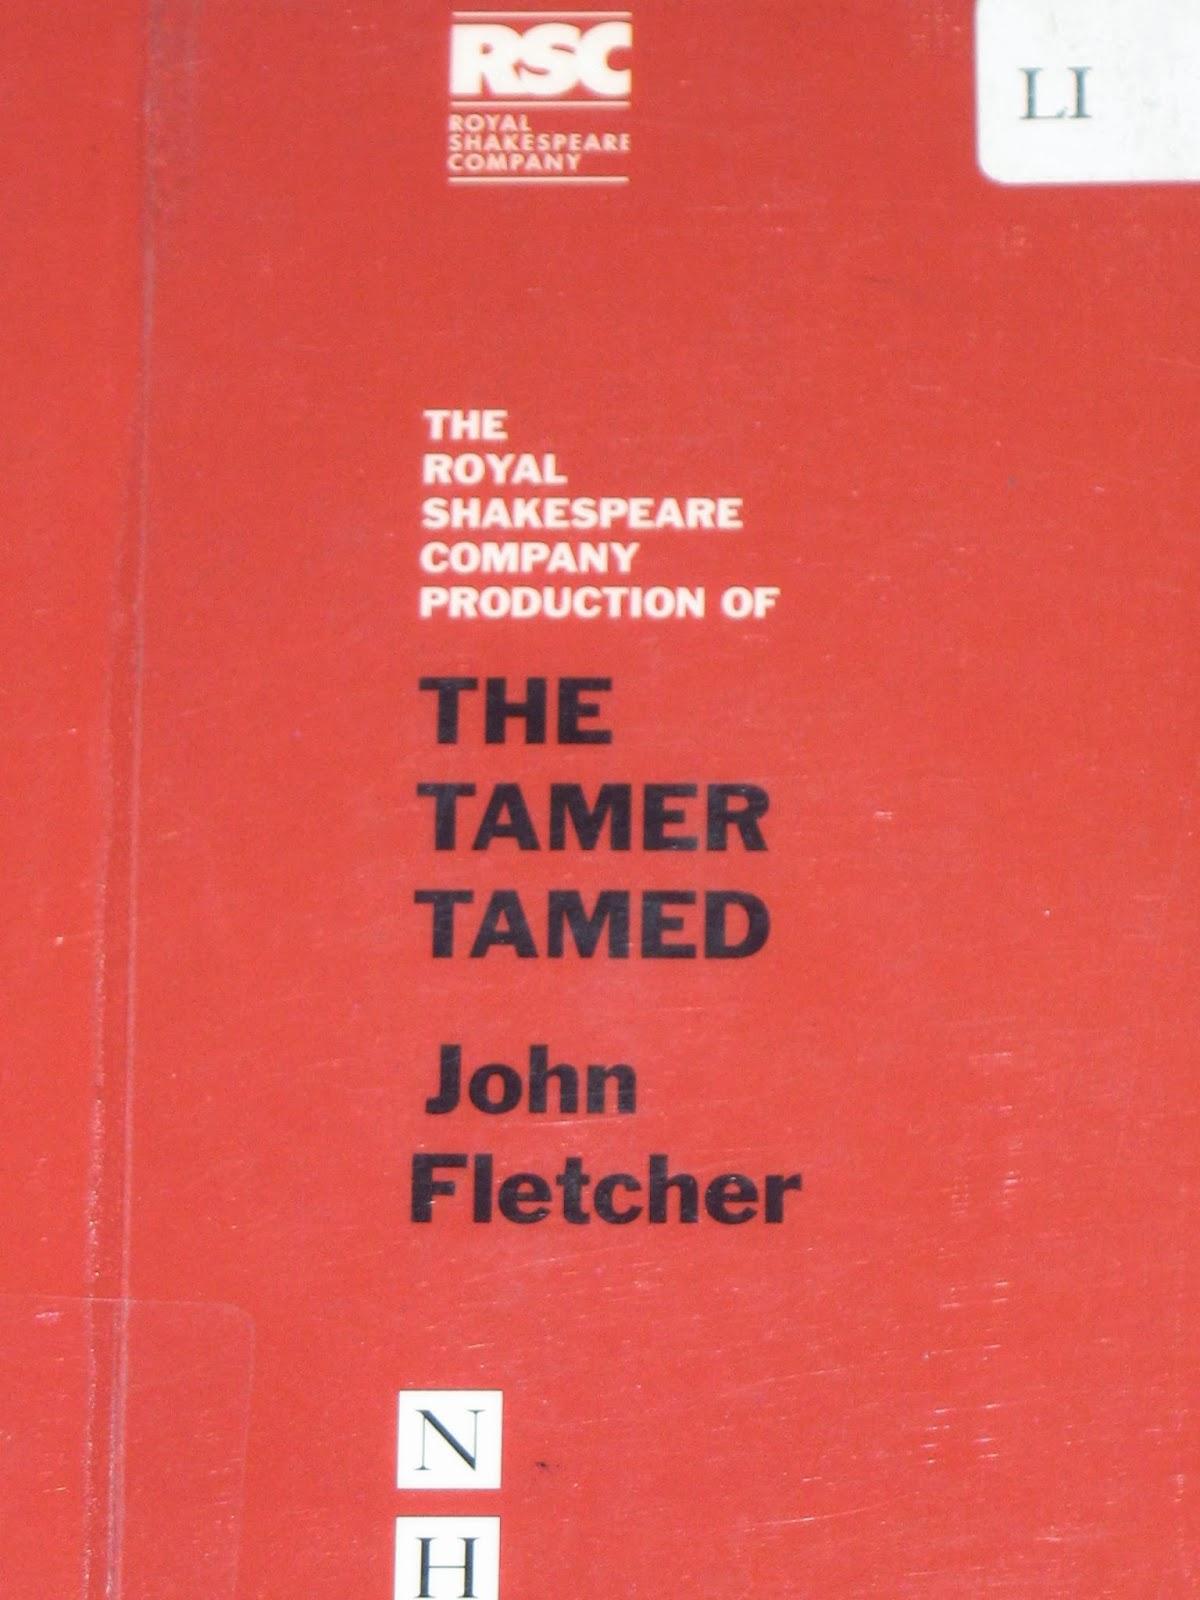 taming of the shrew essays katharina s development reportd taming of the shrew essays katharina s development